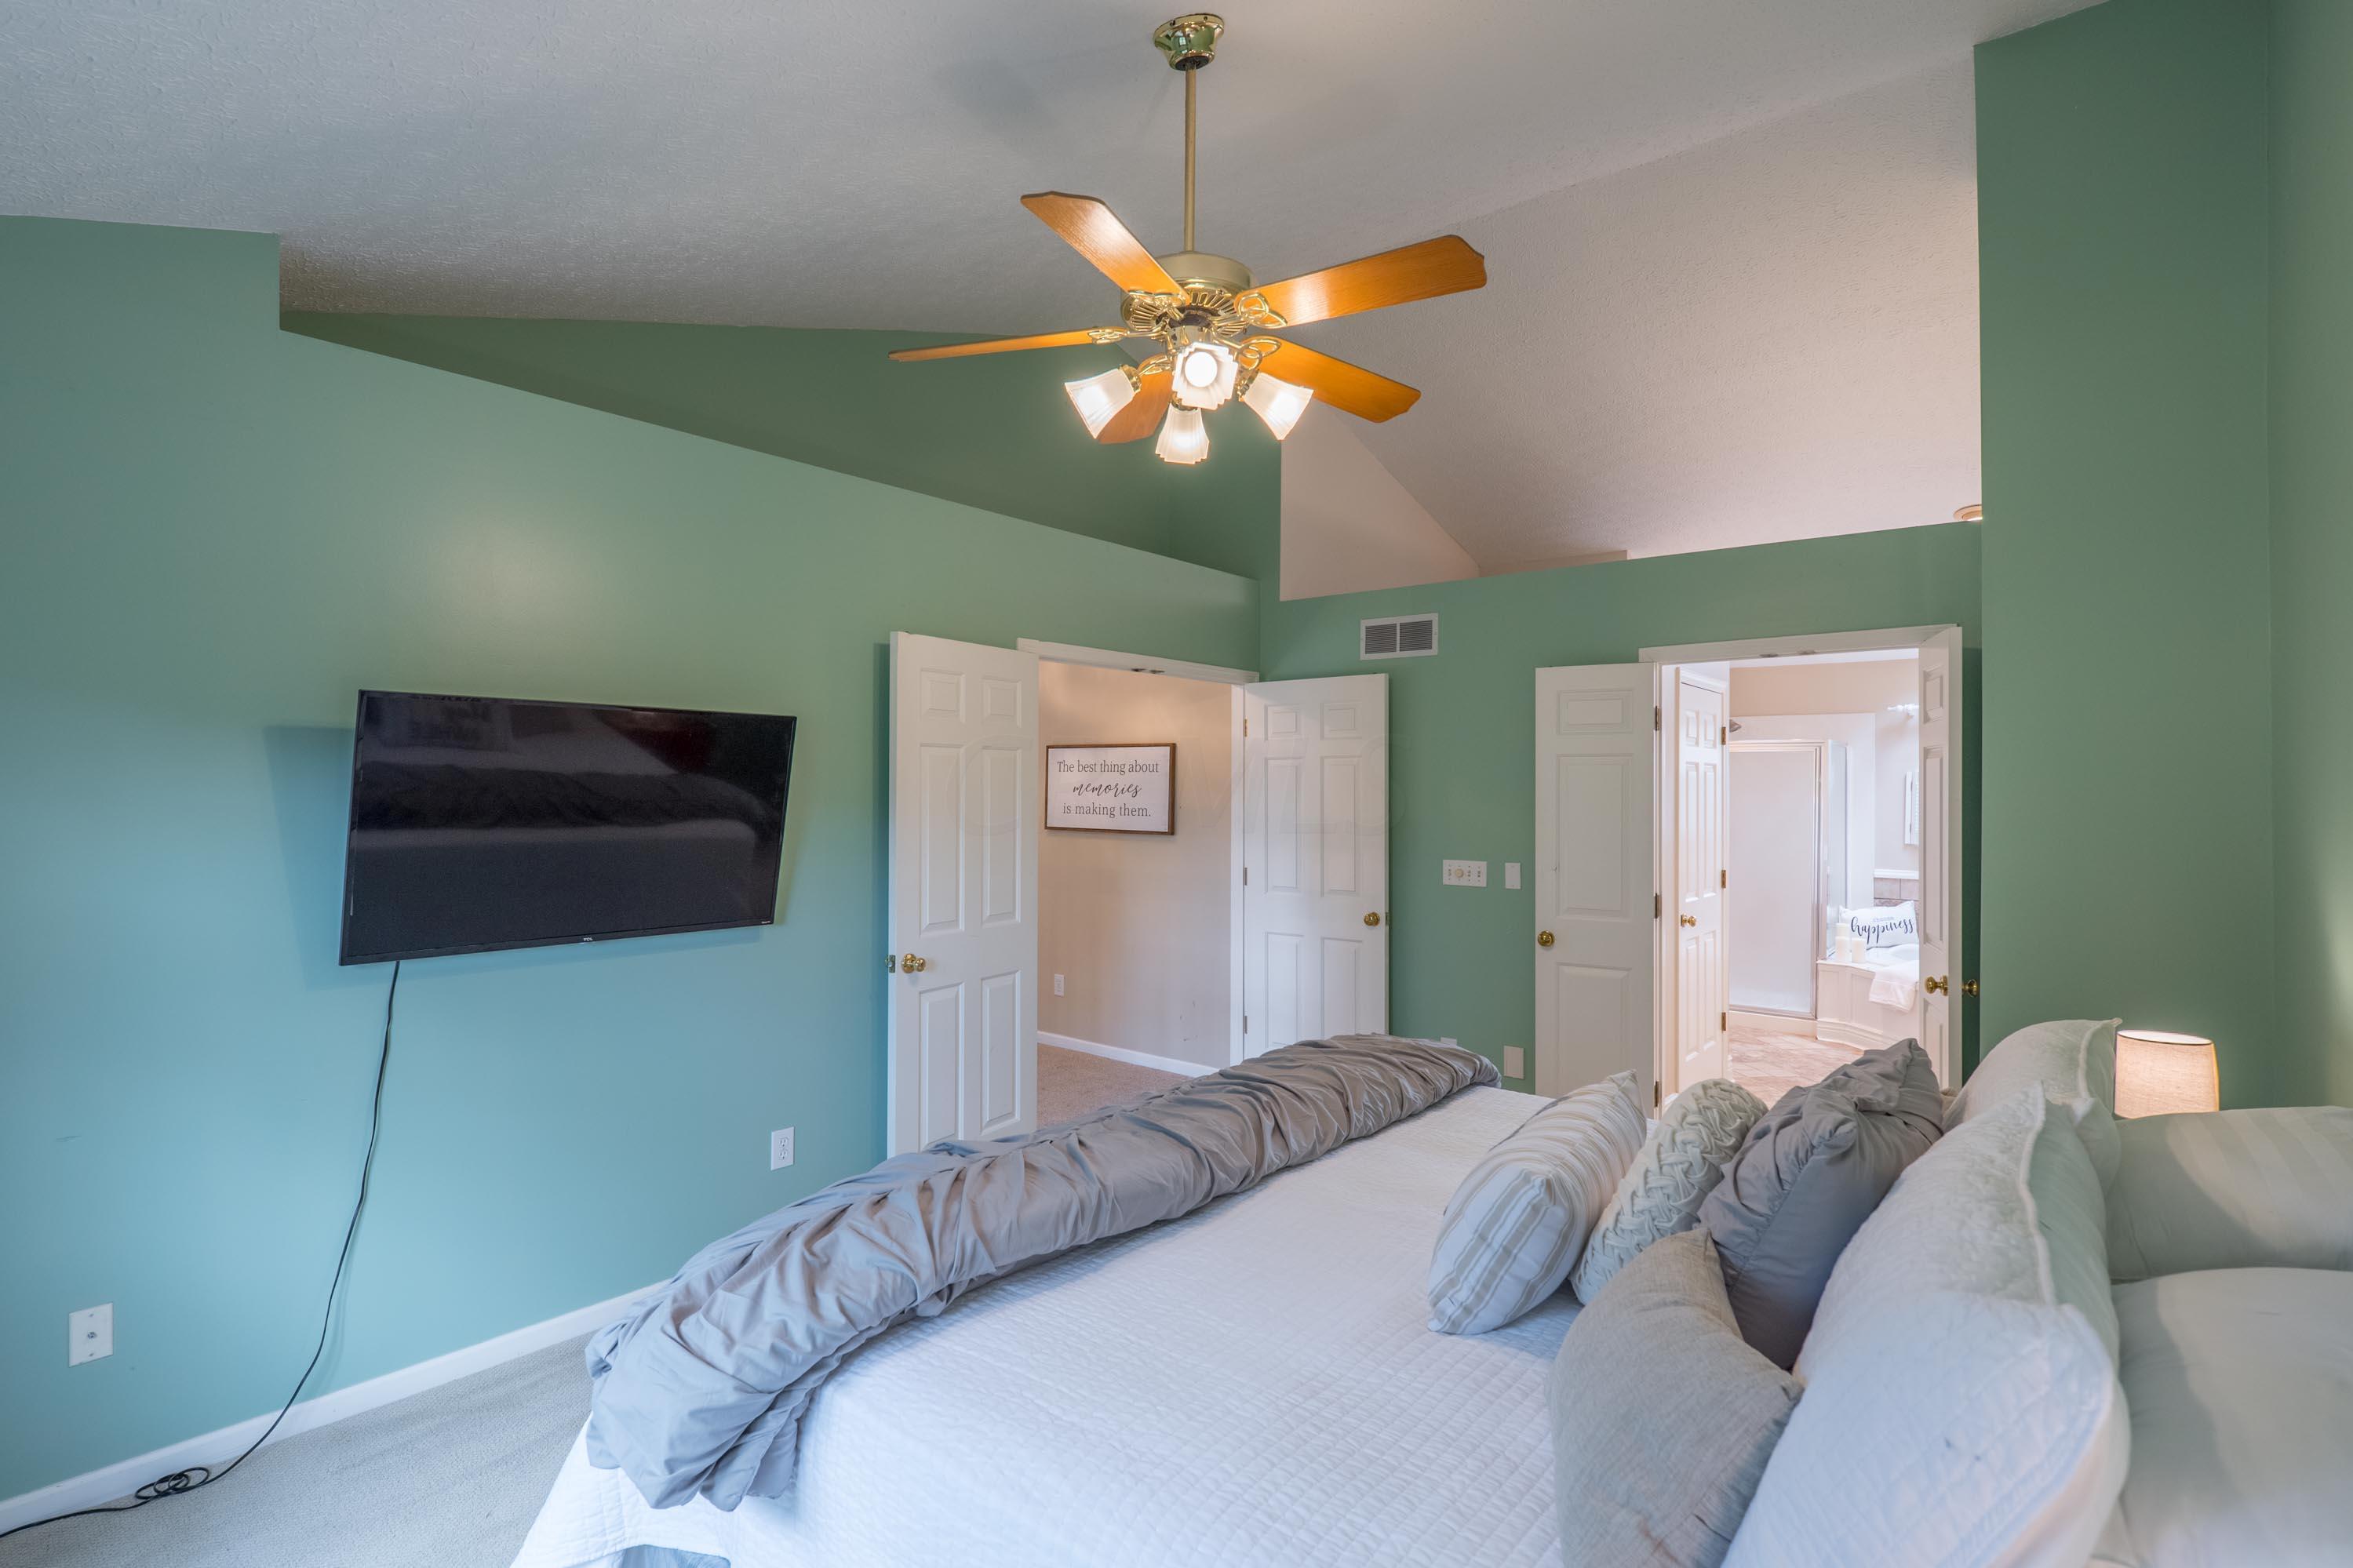 3959 Davidson Run Court, Hilliard, Ohio 43026, 4 Bedrooms Bedrooms, ,4 BathroomsBathrooms,Residential,For Sale,Davidson Run,220020528